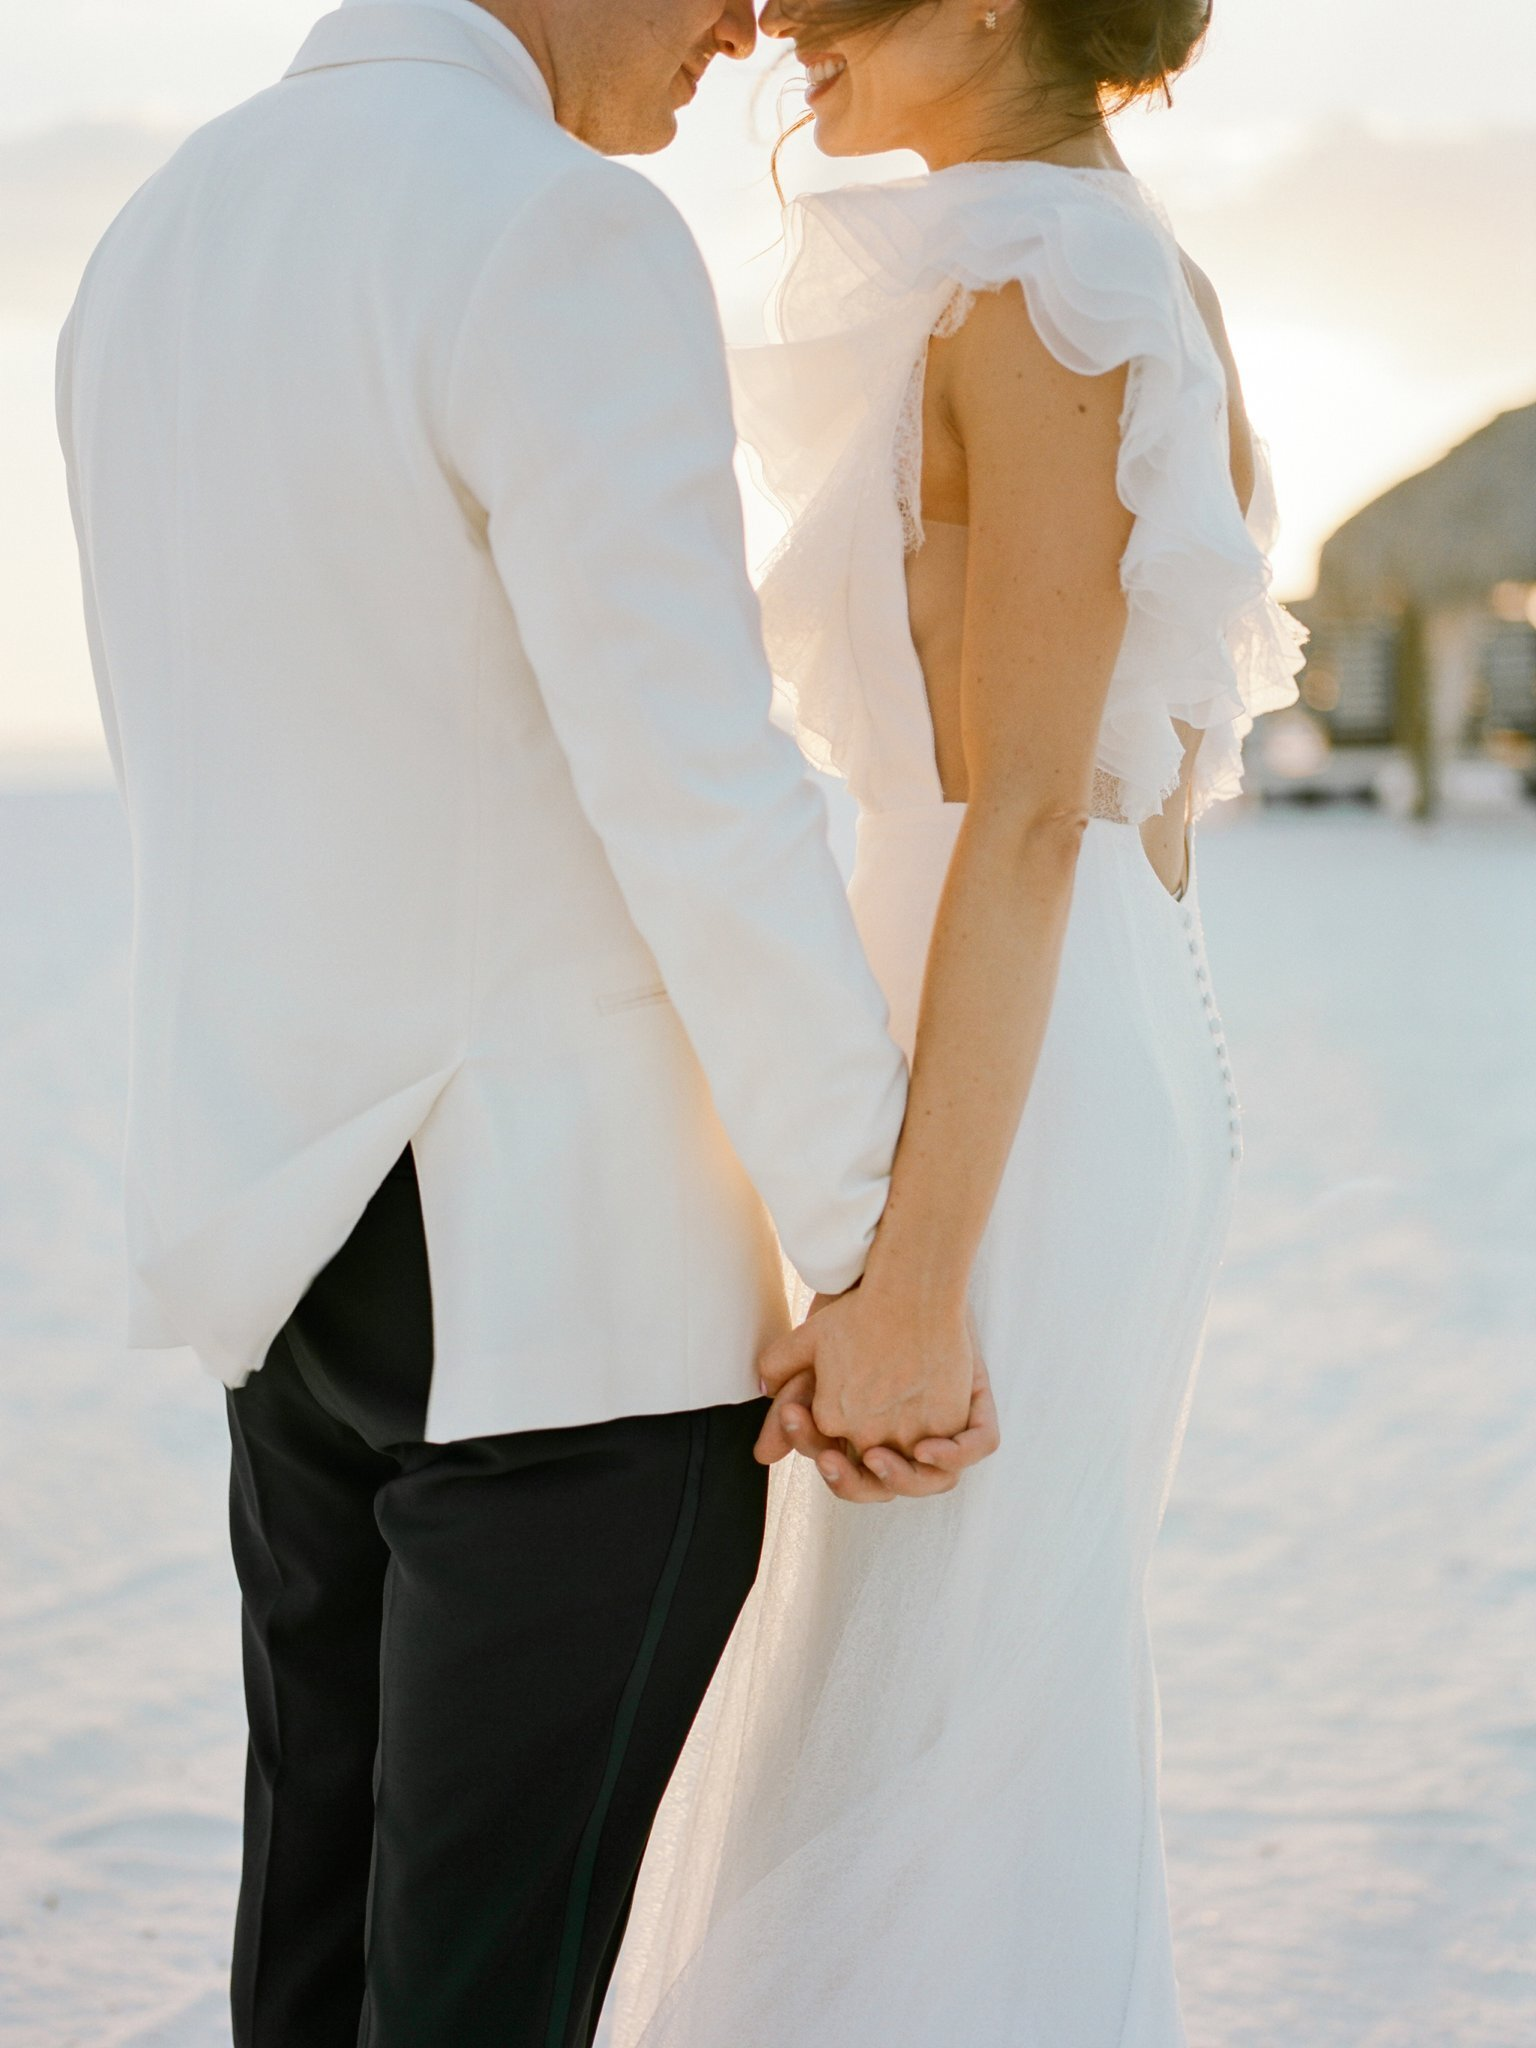 jw marriott marco island wedding photographer marco island wedding photographer shannon griffin photography_0206.jpg